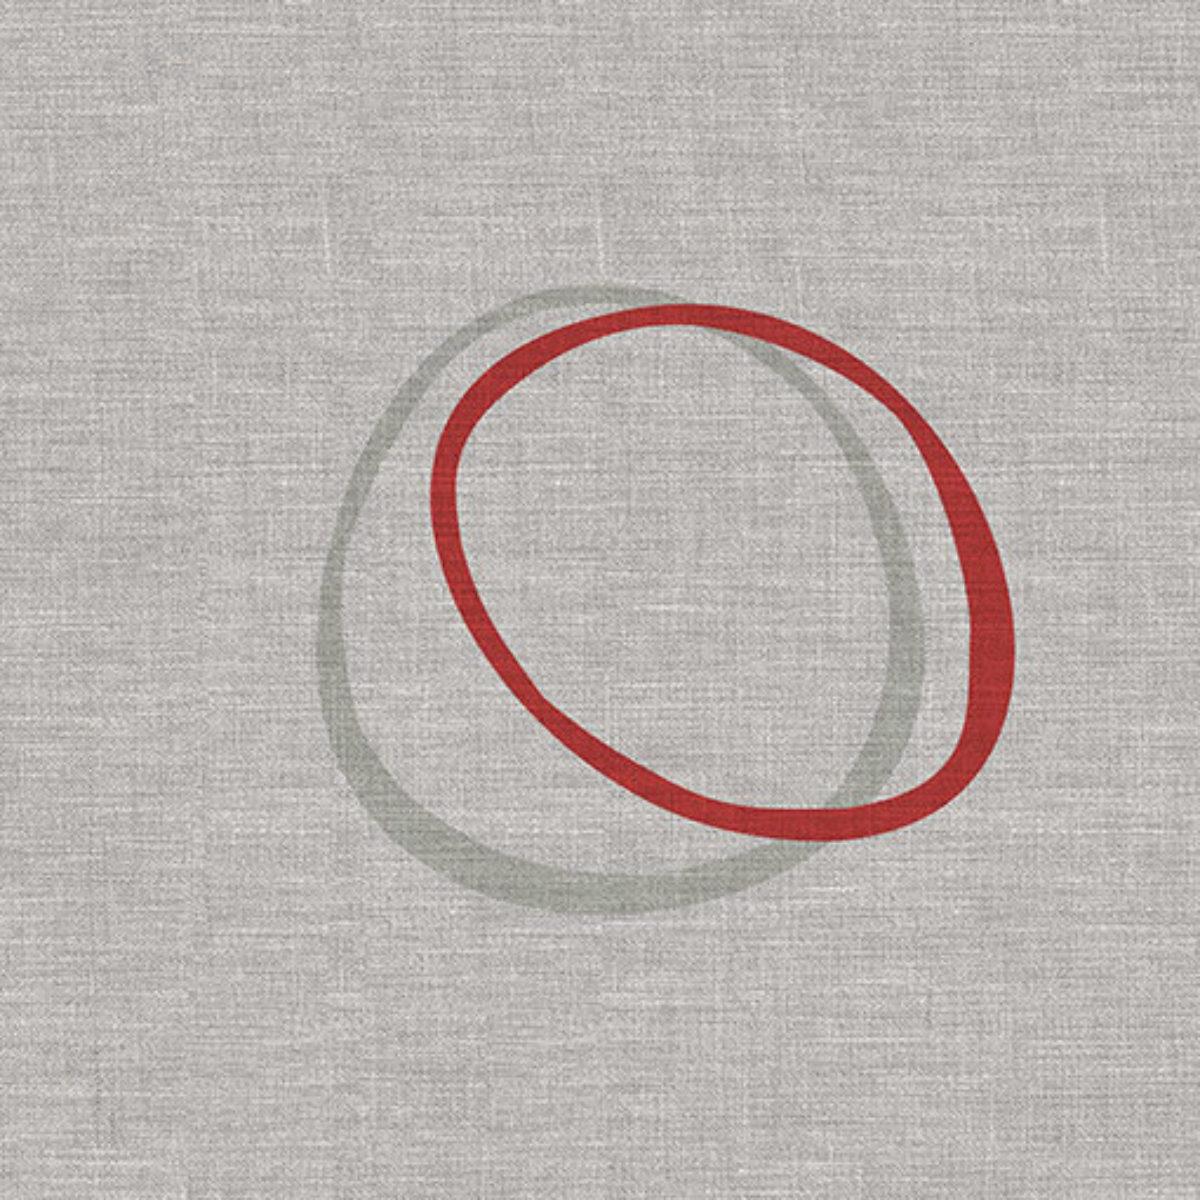 Ploeg gordijnen in between vitrage stoffen collectie 0104410018 circle 18 large